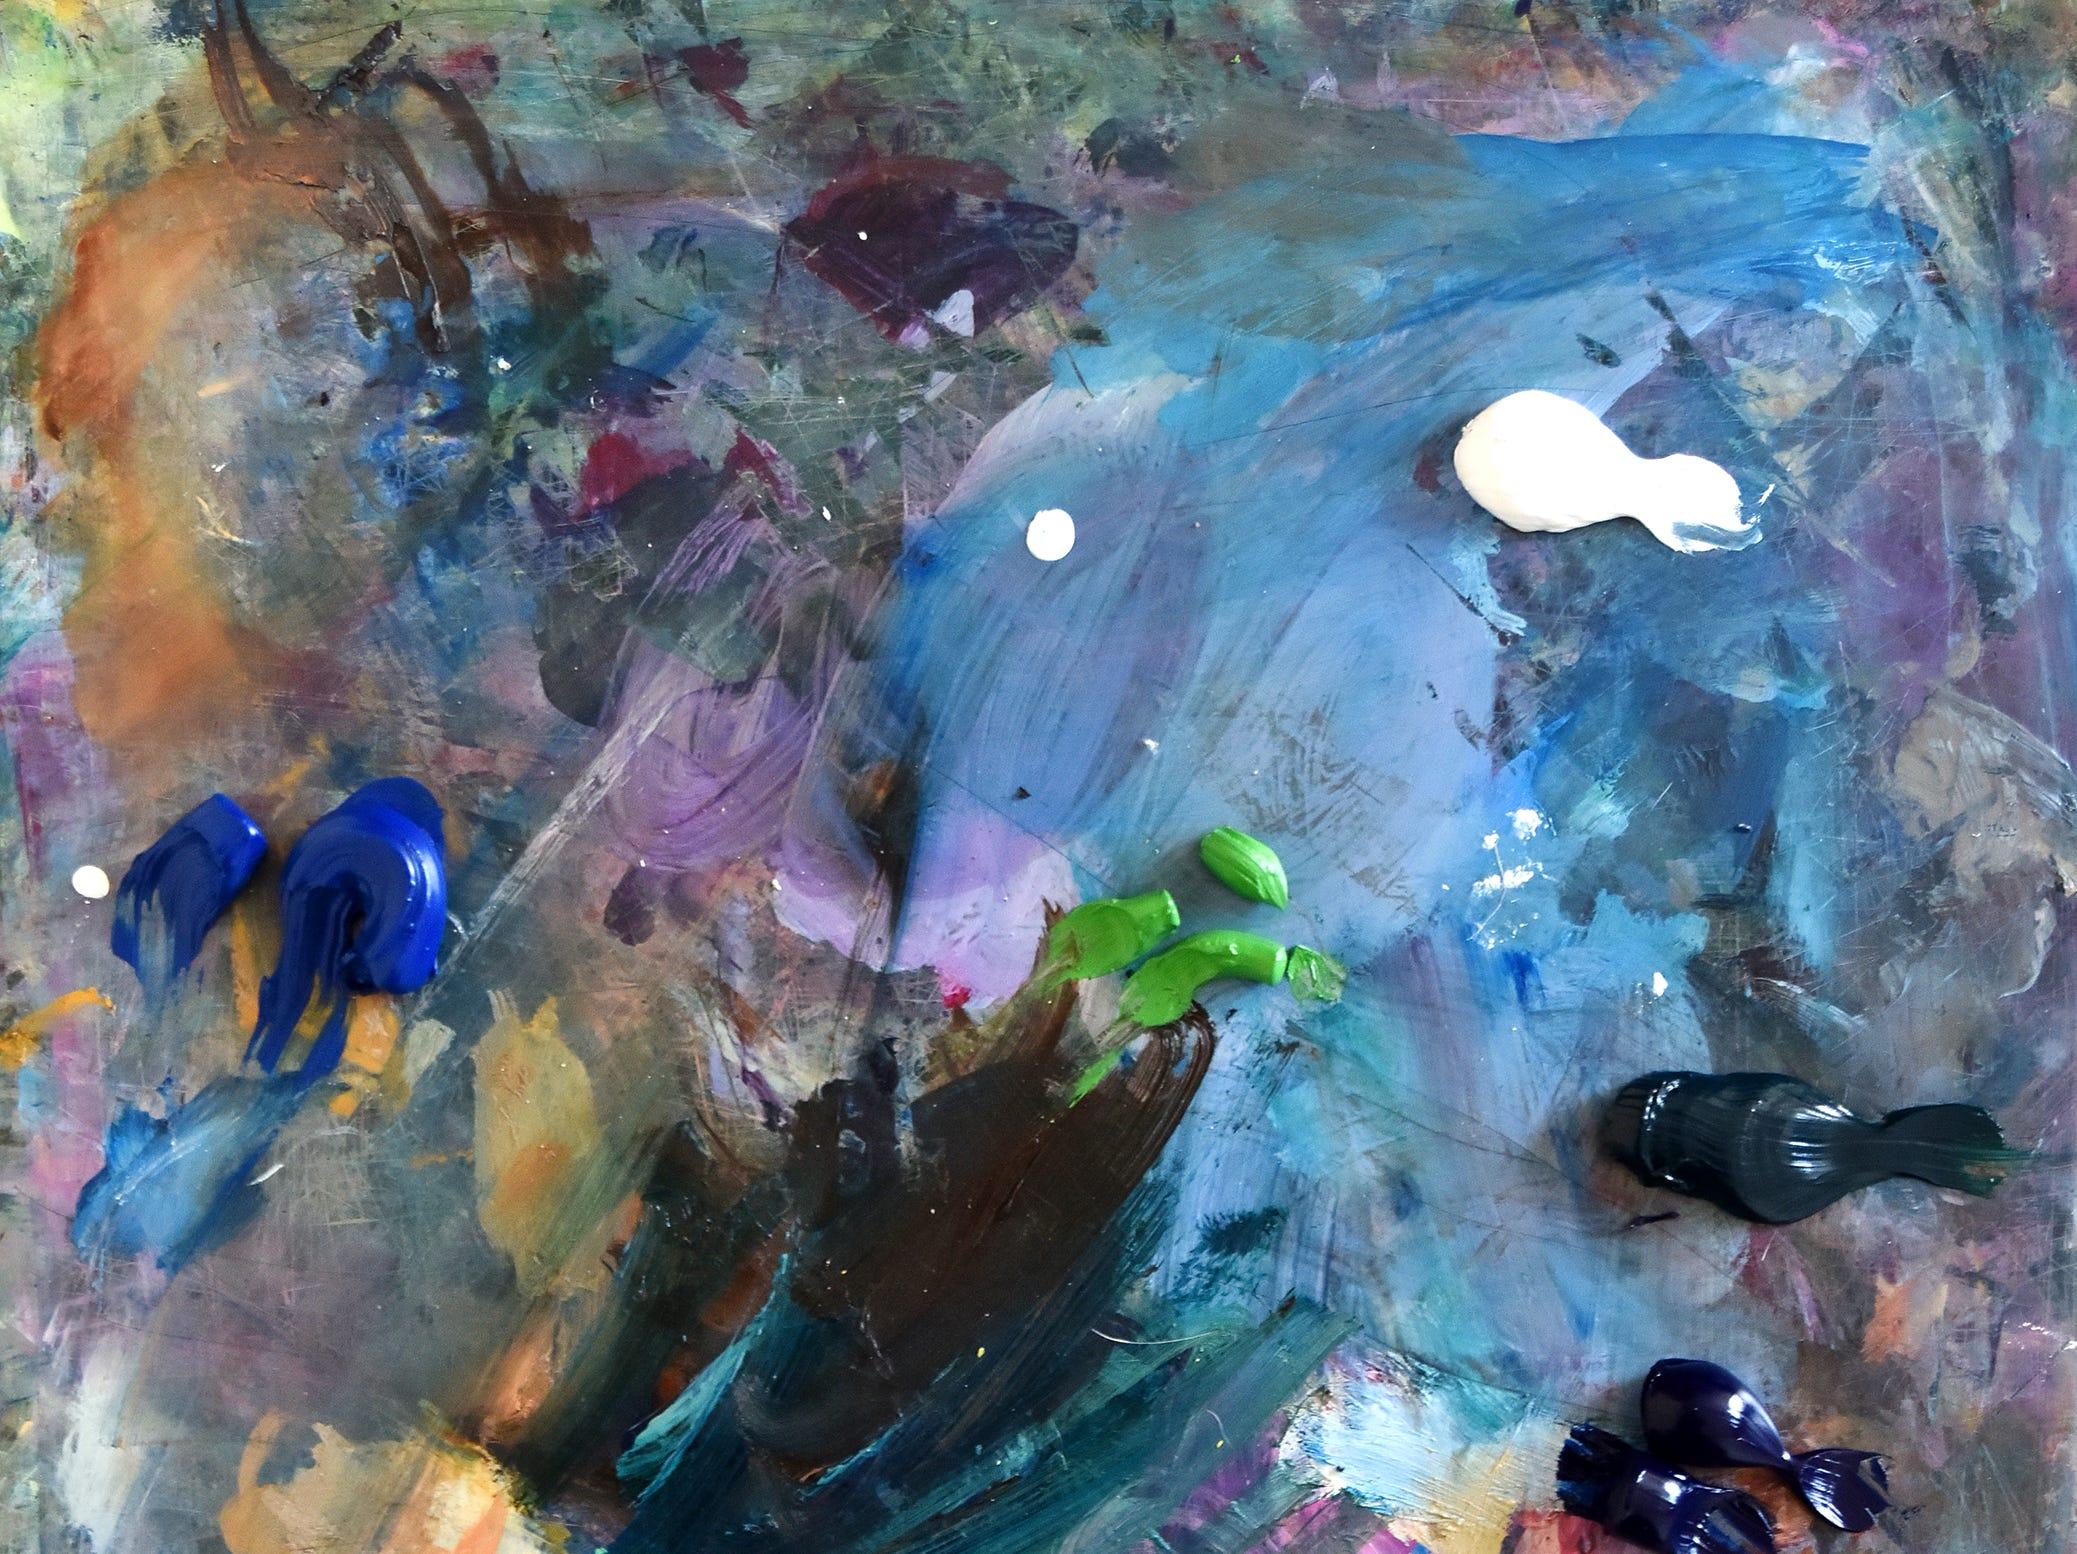 A palette used by artist Tatyana Grechina